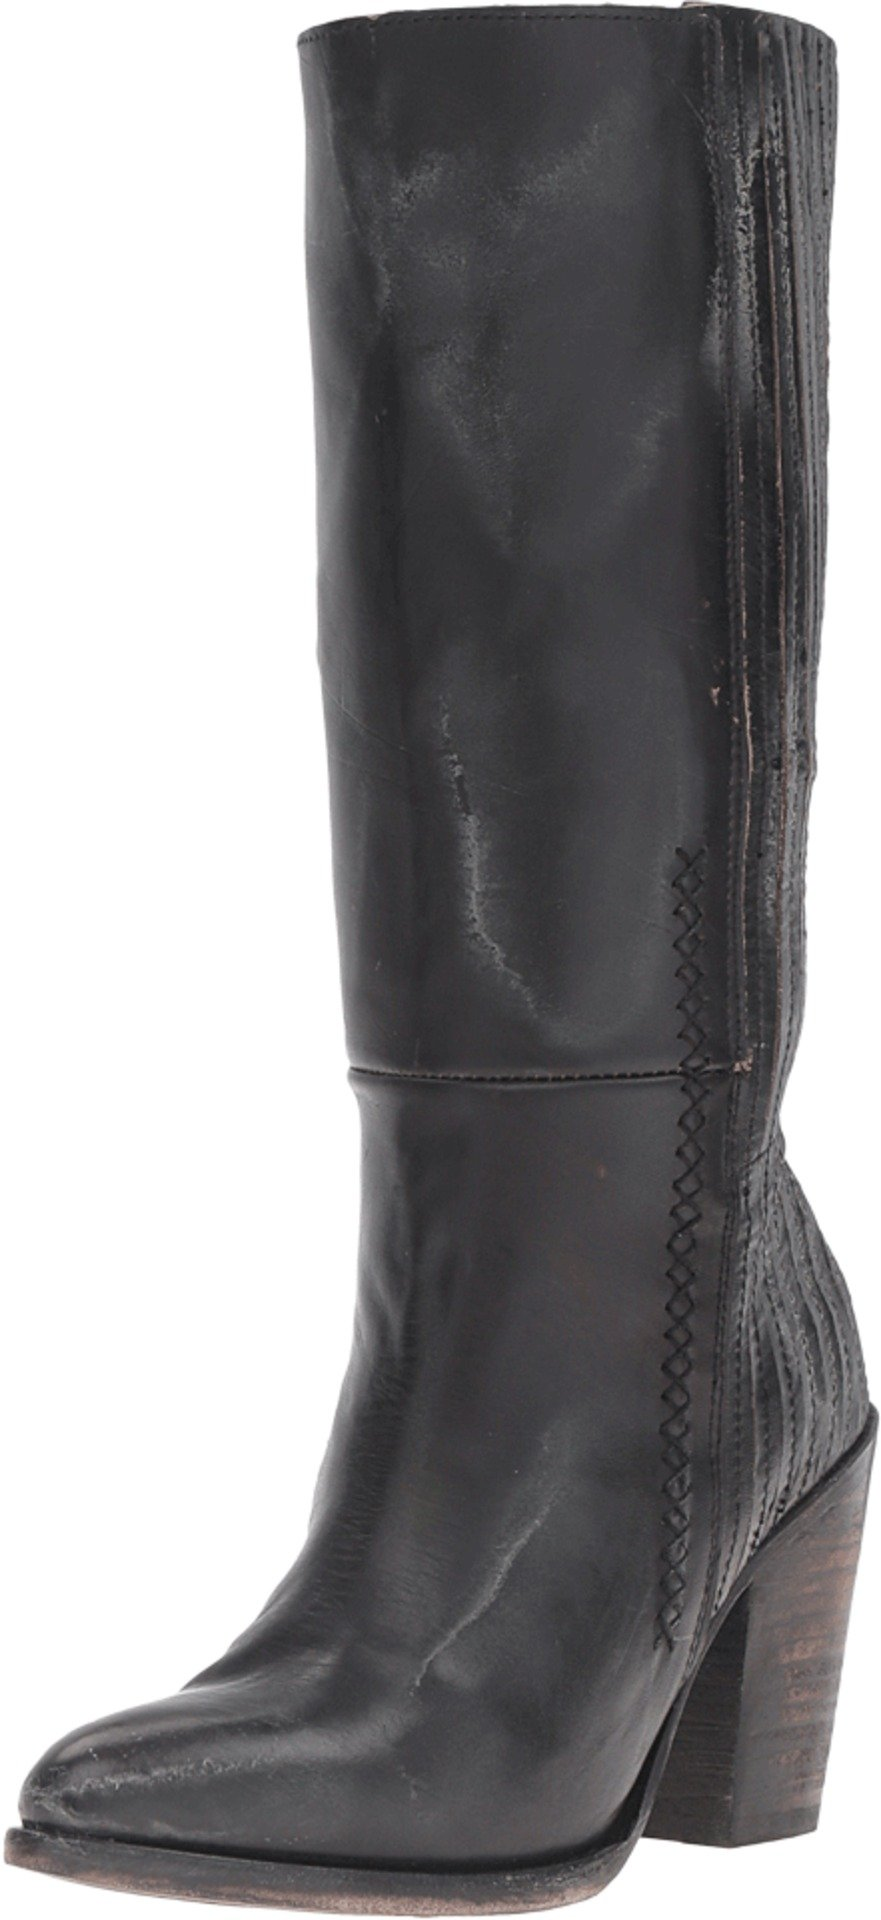 Freebird Women's Knife Riding Boot, Black, 8 M US